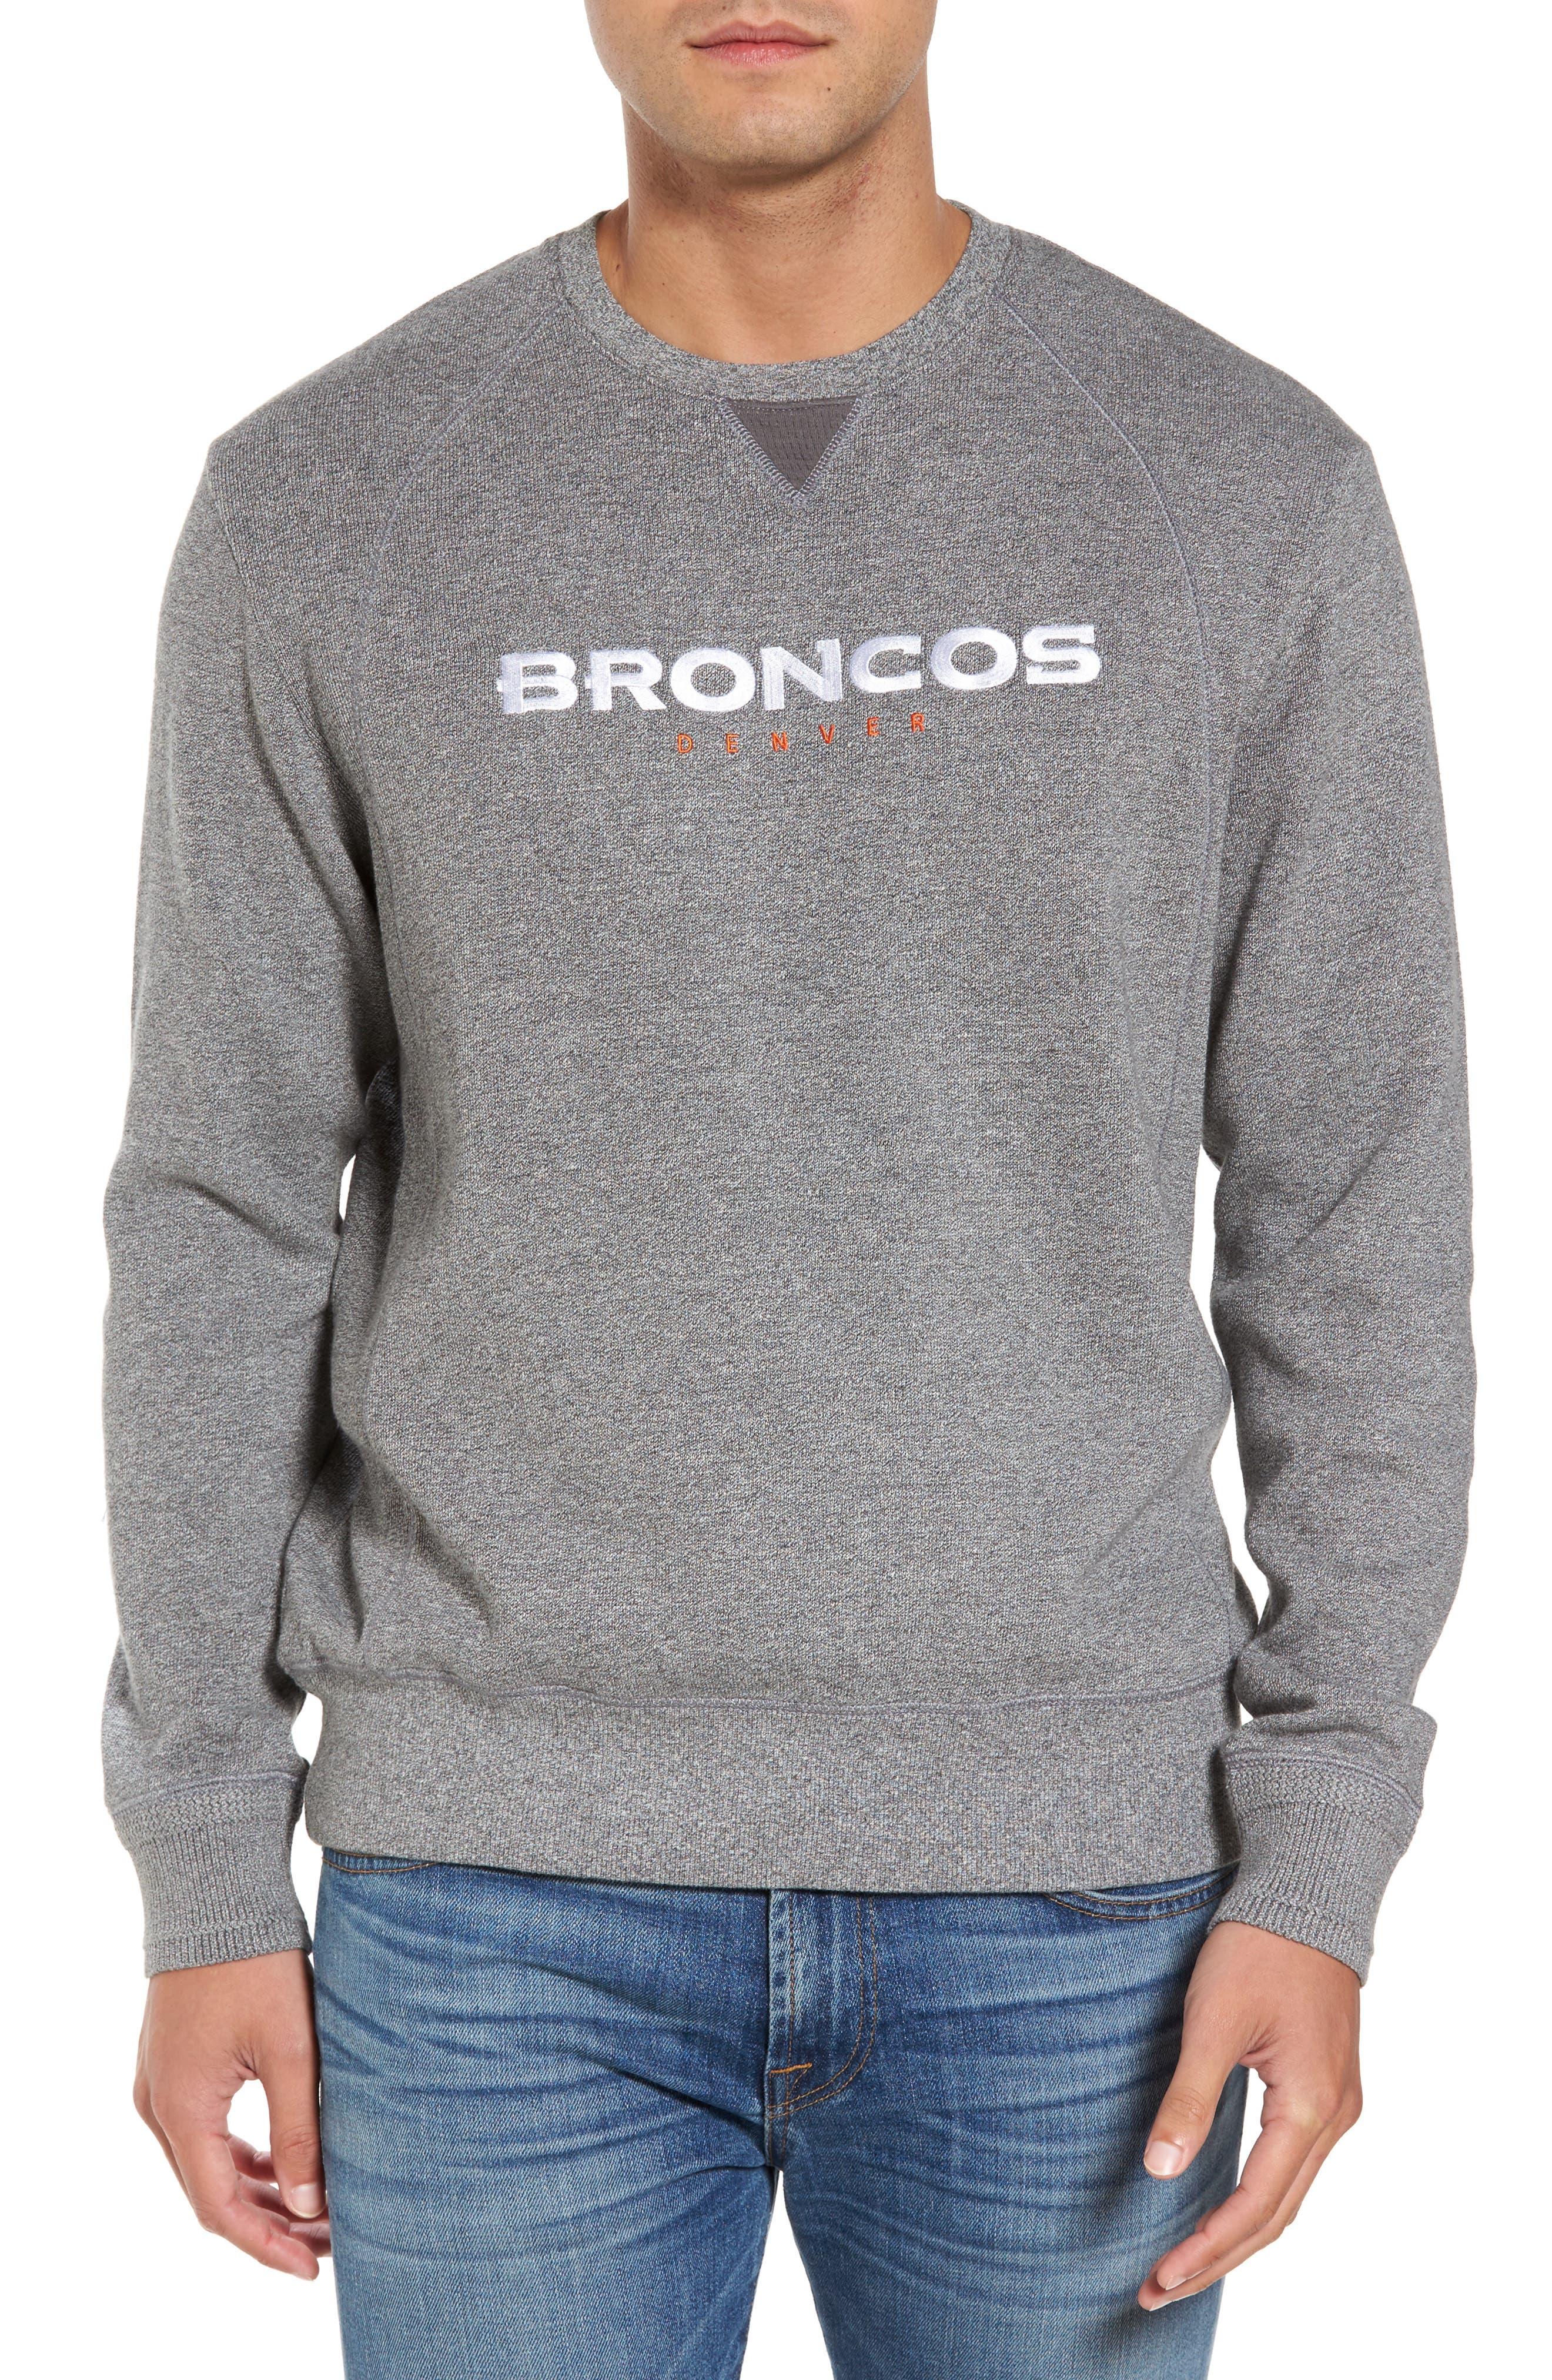 NFL Stitch of Liberty Embroidered Crewneck Sweatshirt,                             Main thumbnail 6, color,